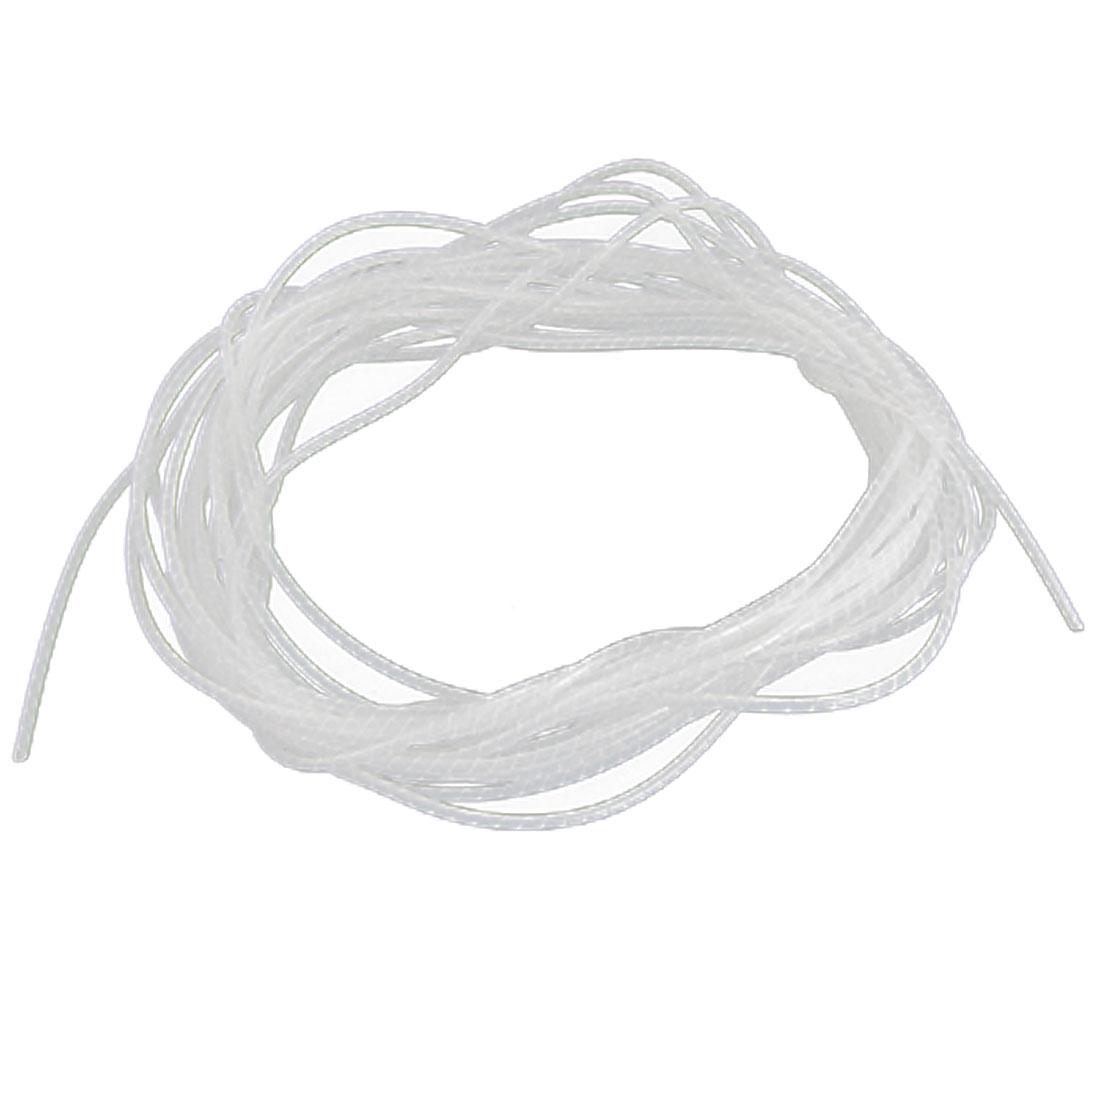 White PE 11M Insulation Binding Strength Spiral Wrapper